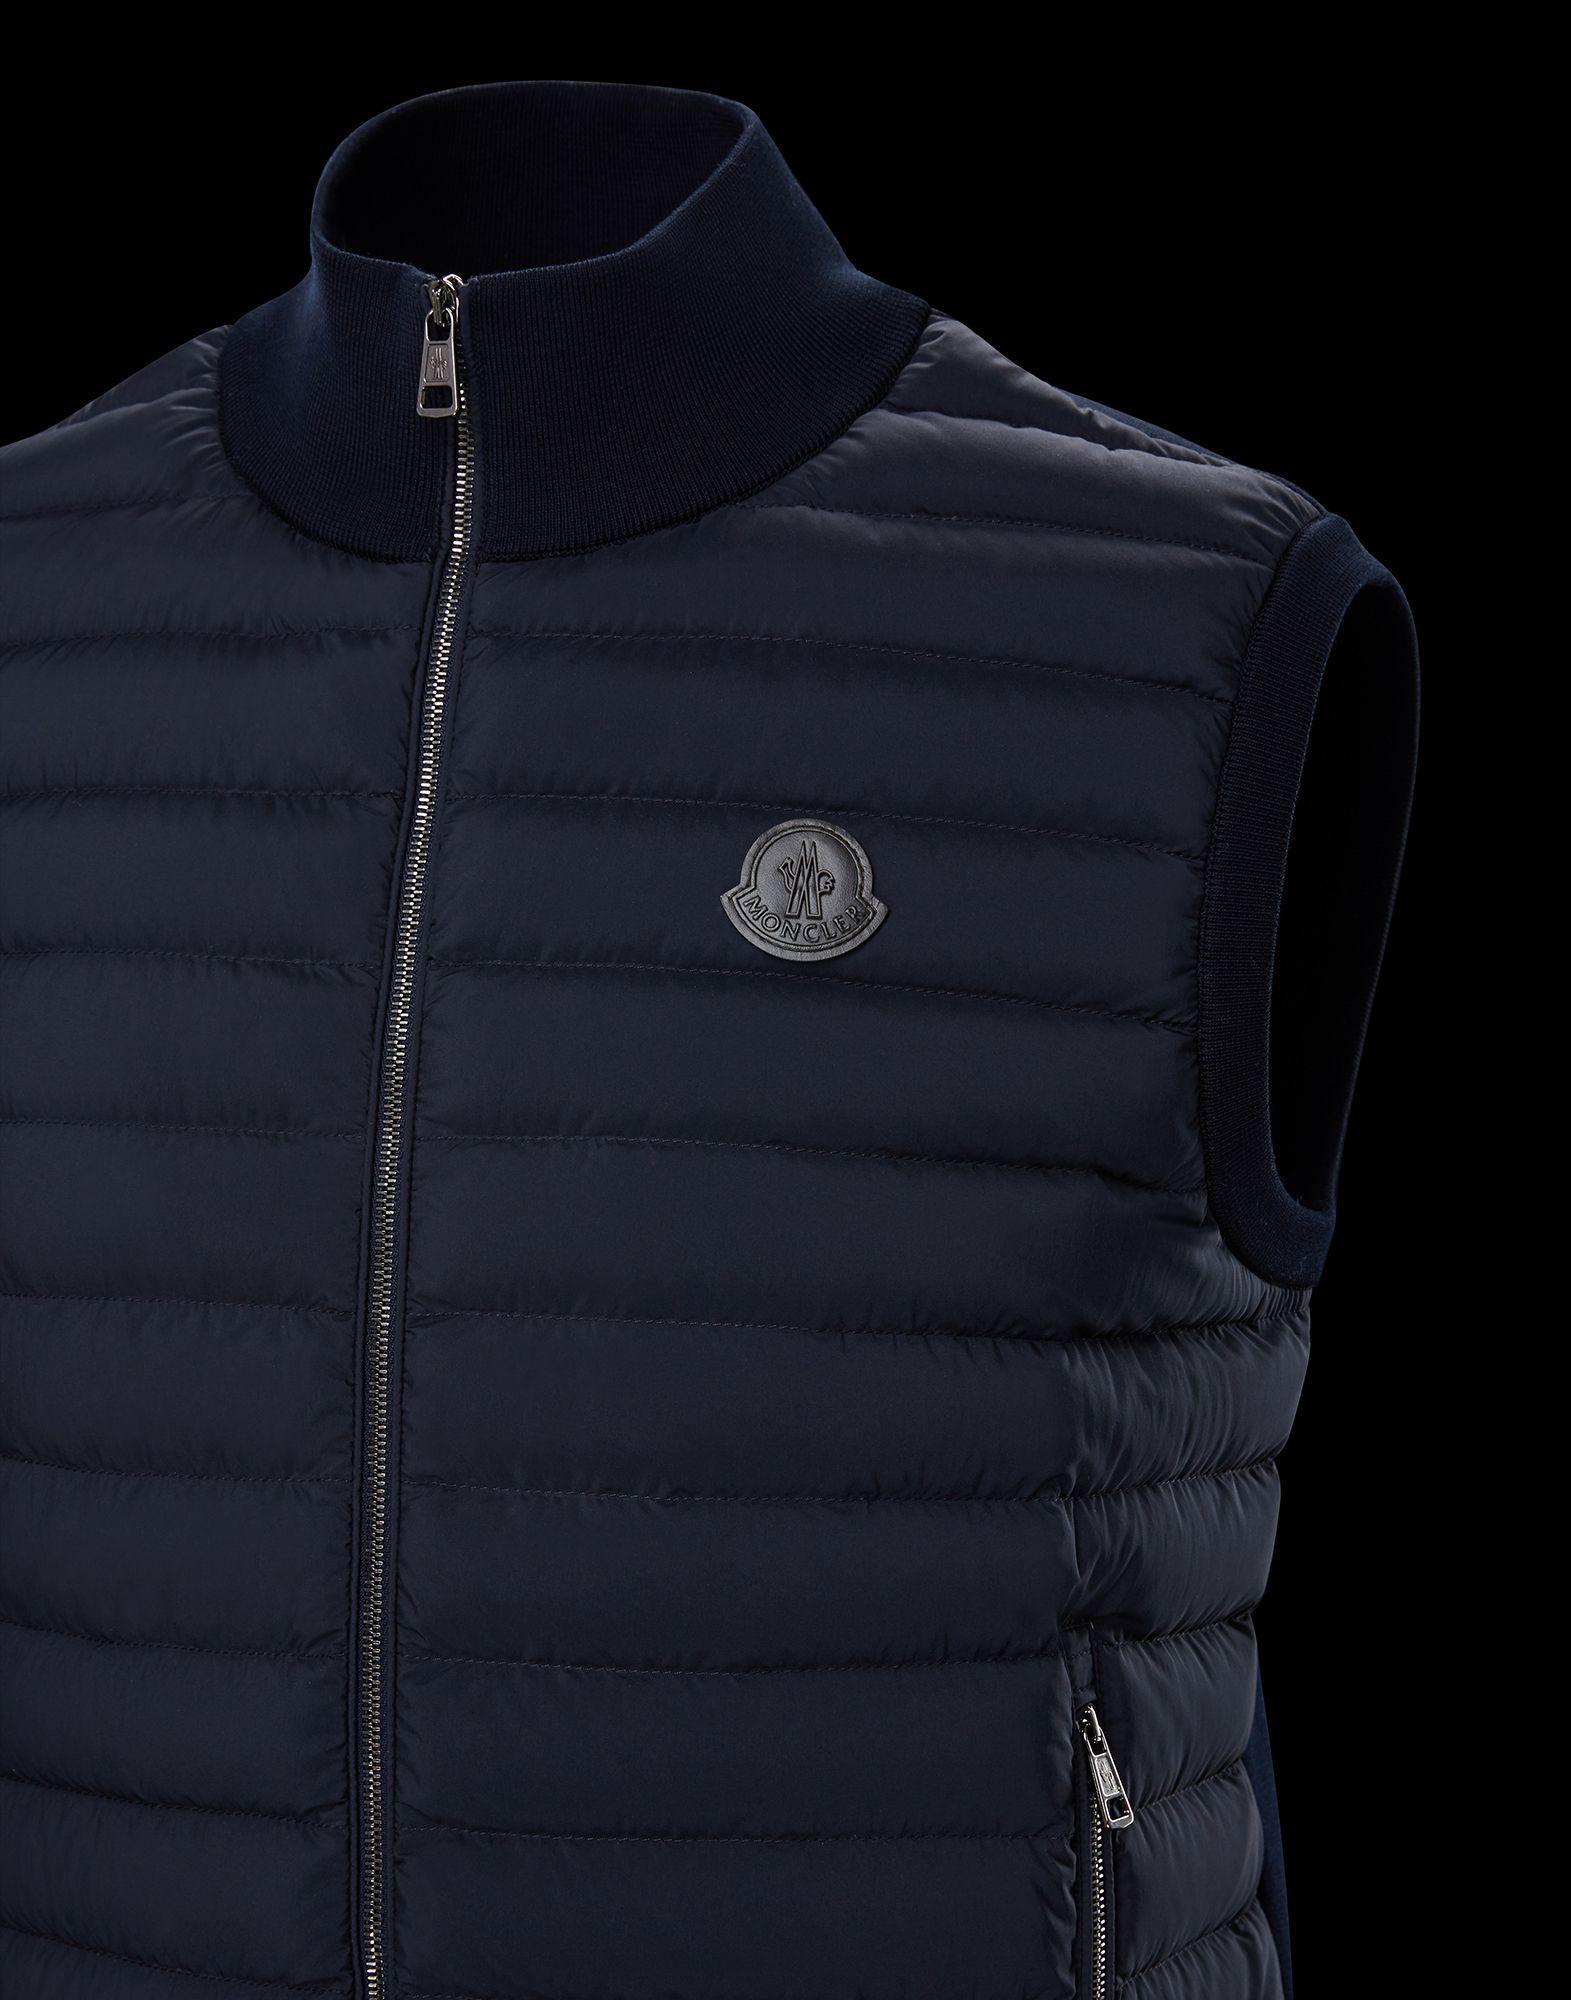 Moncler Waistcoat in Blue for Men - Lyst c880526ffc6